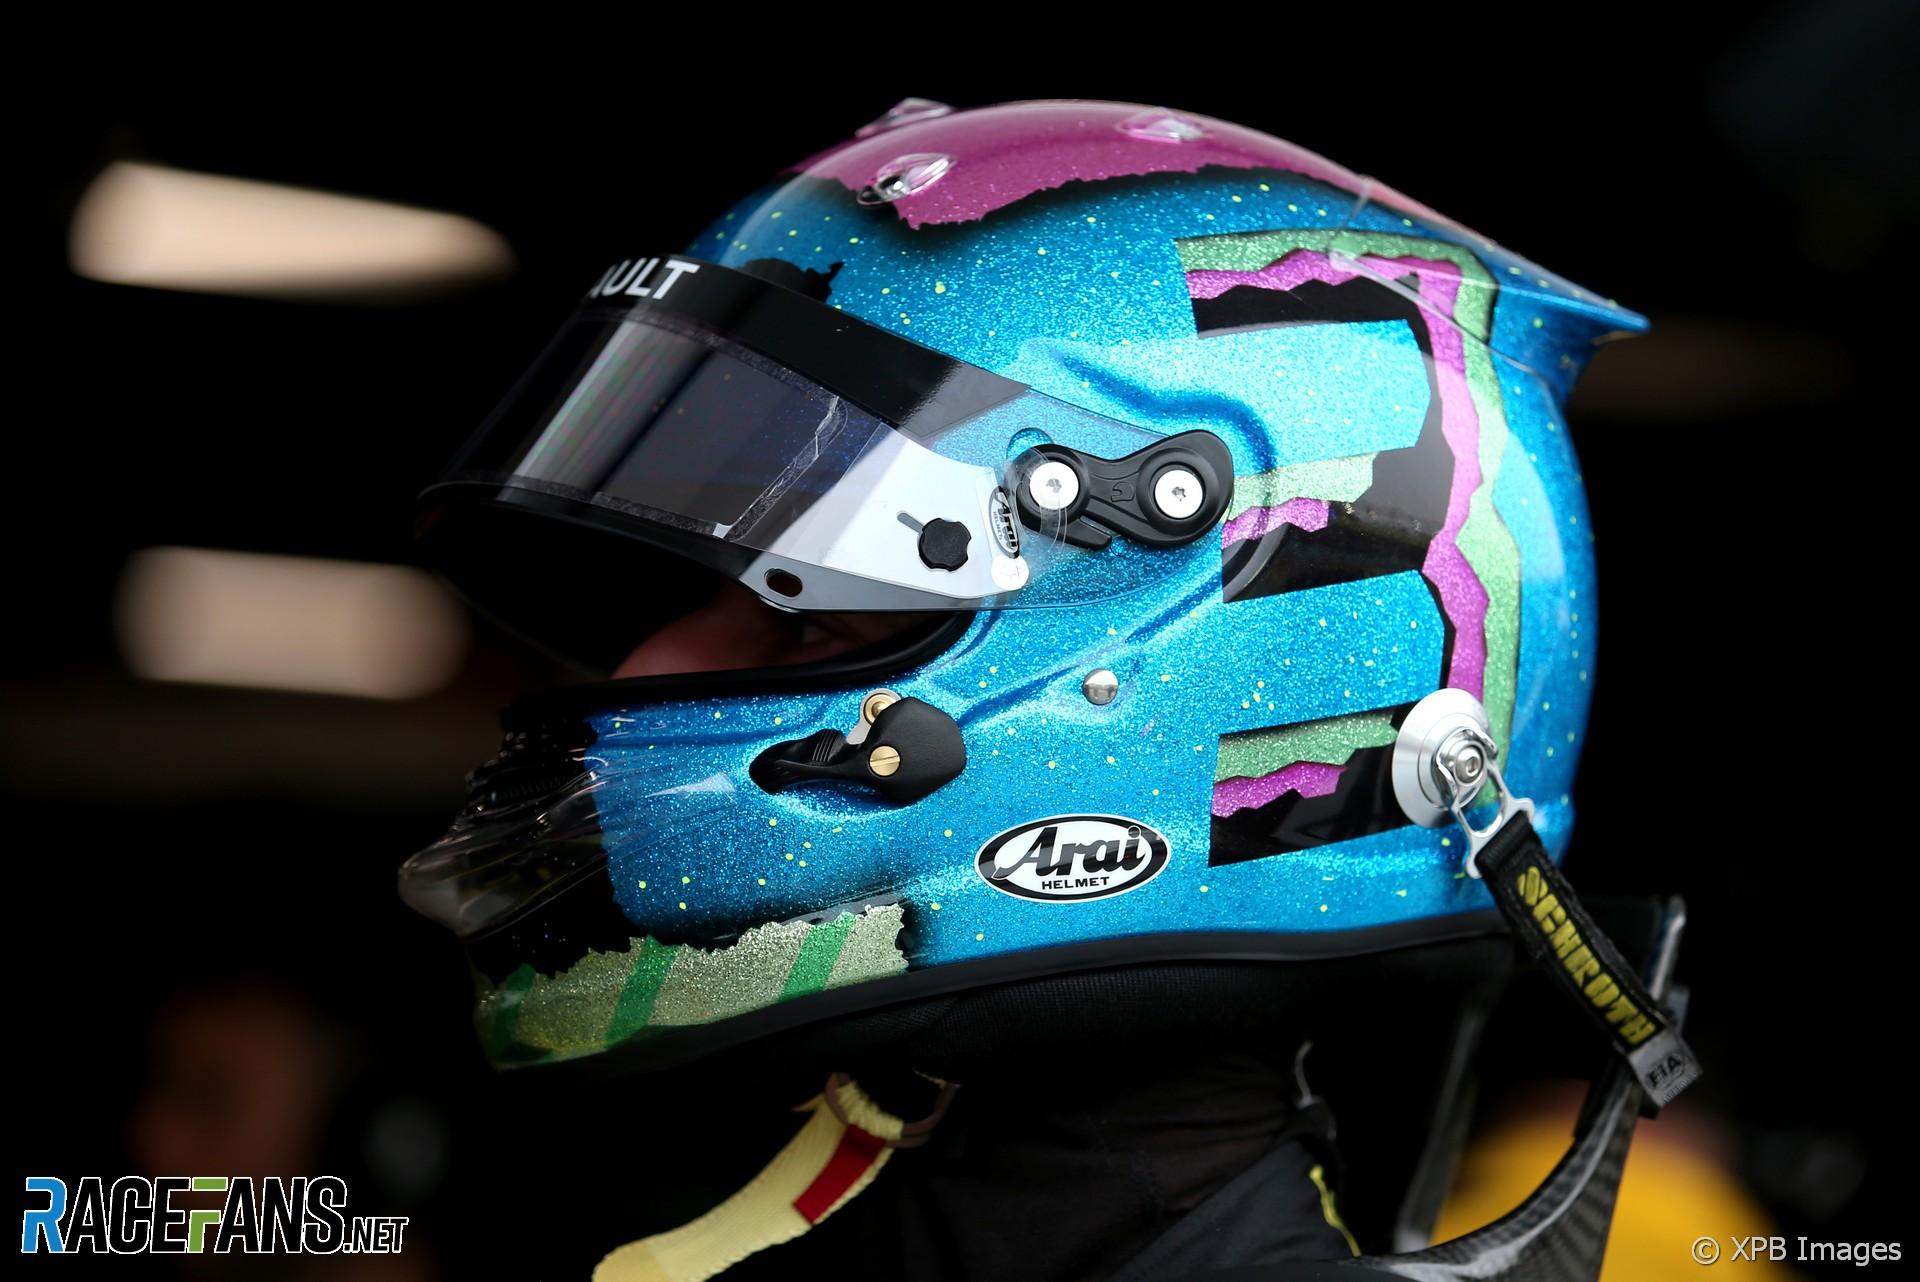 Daniel Ricciardo, Renault, Singapore, 2019